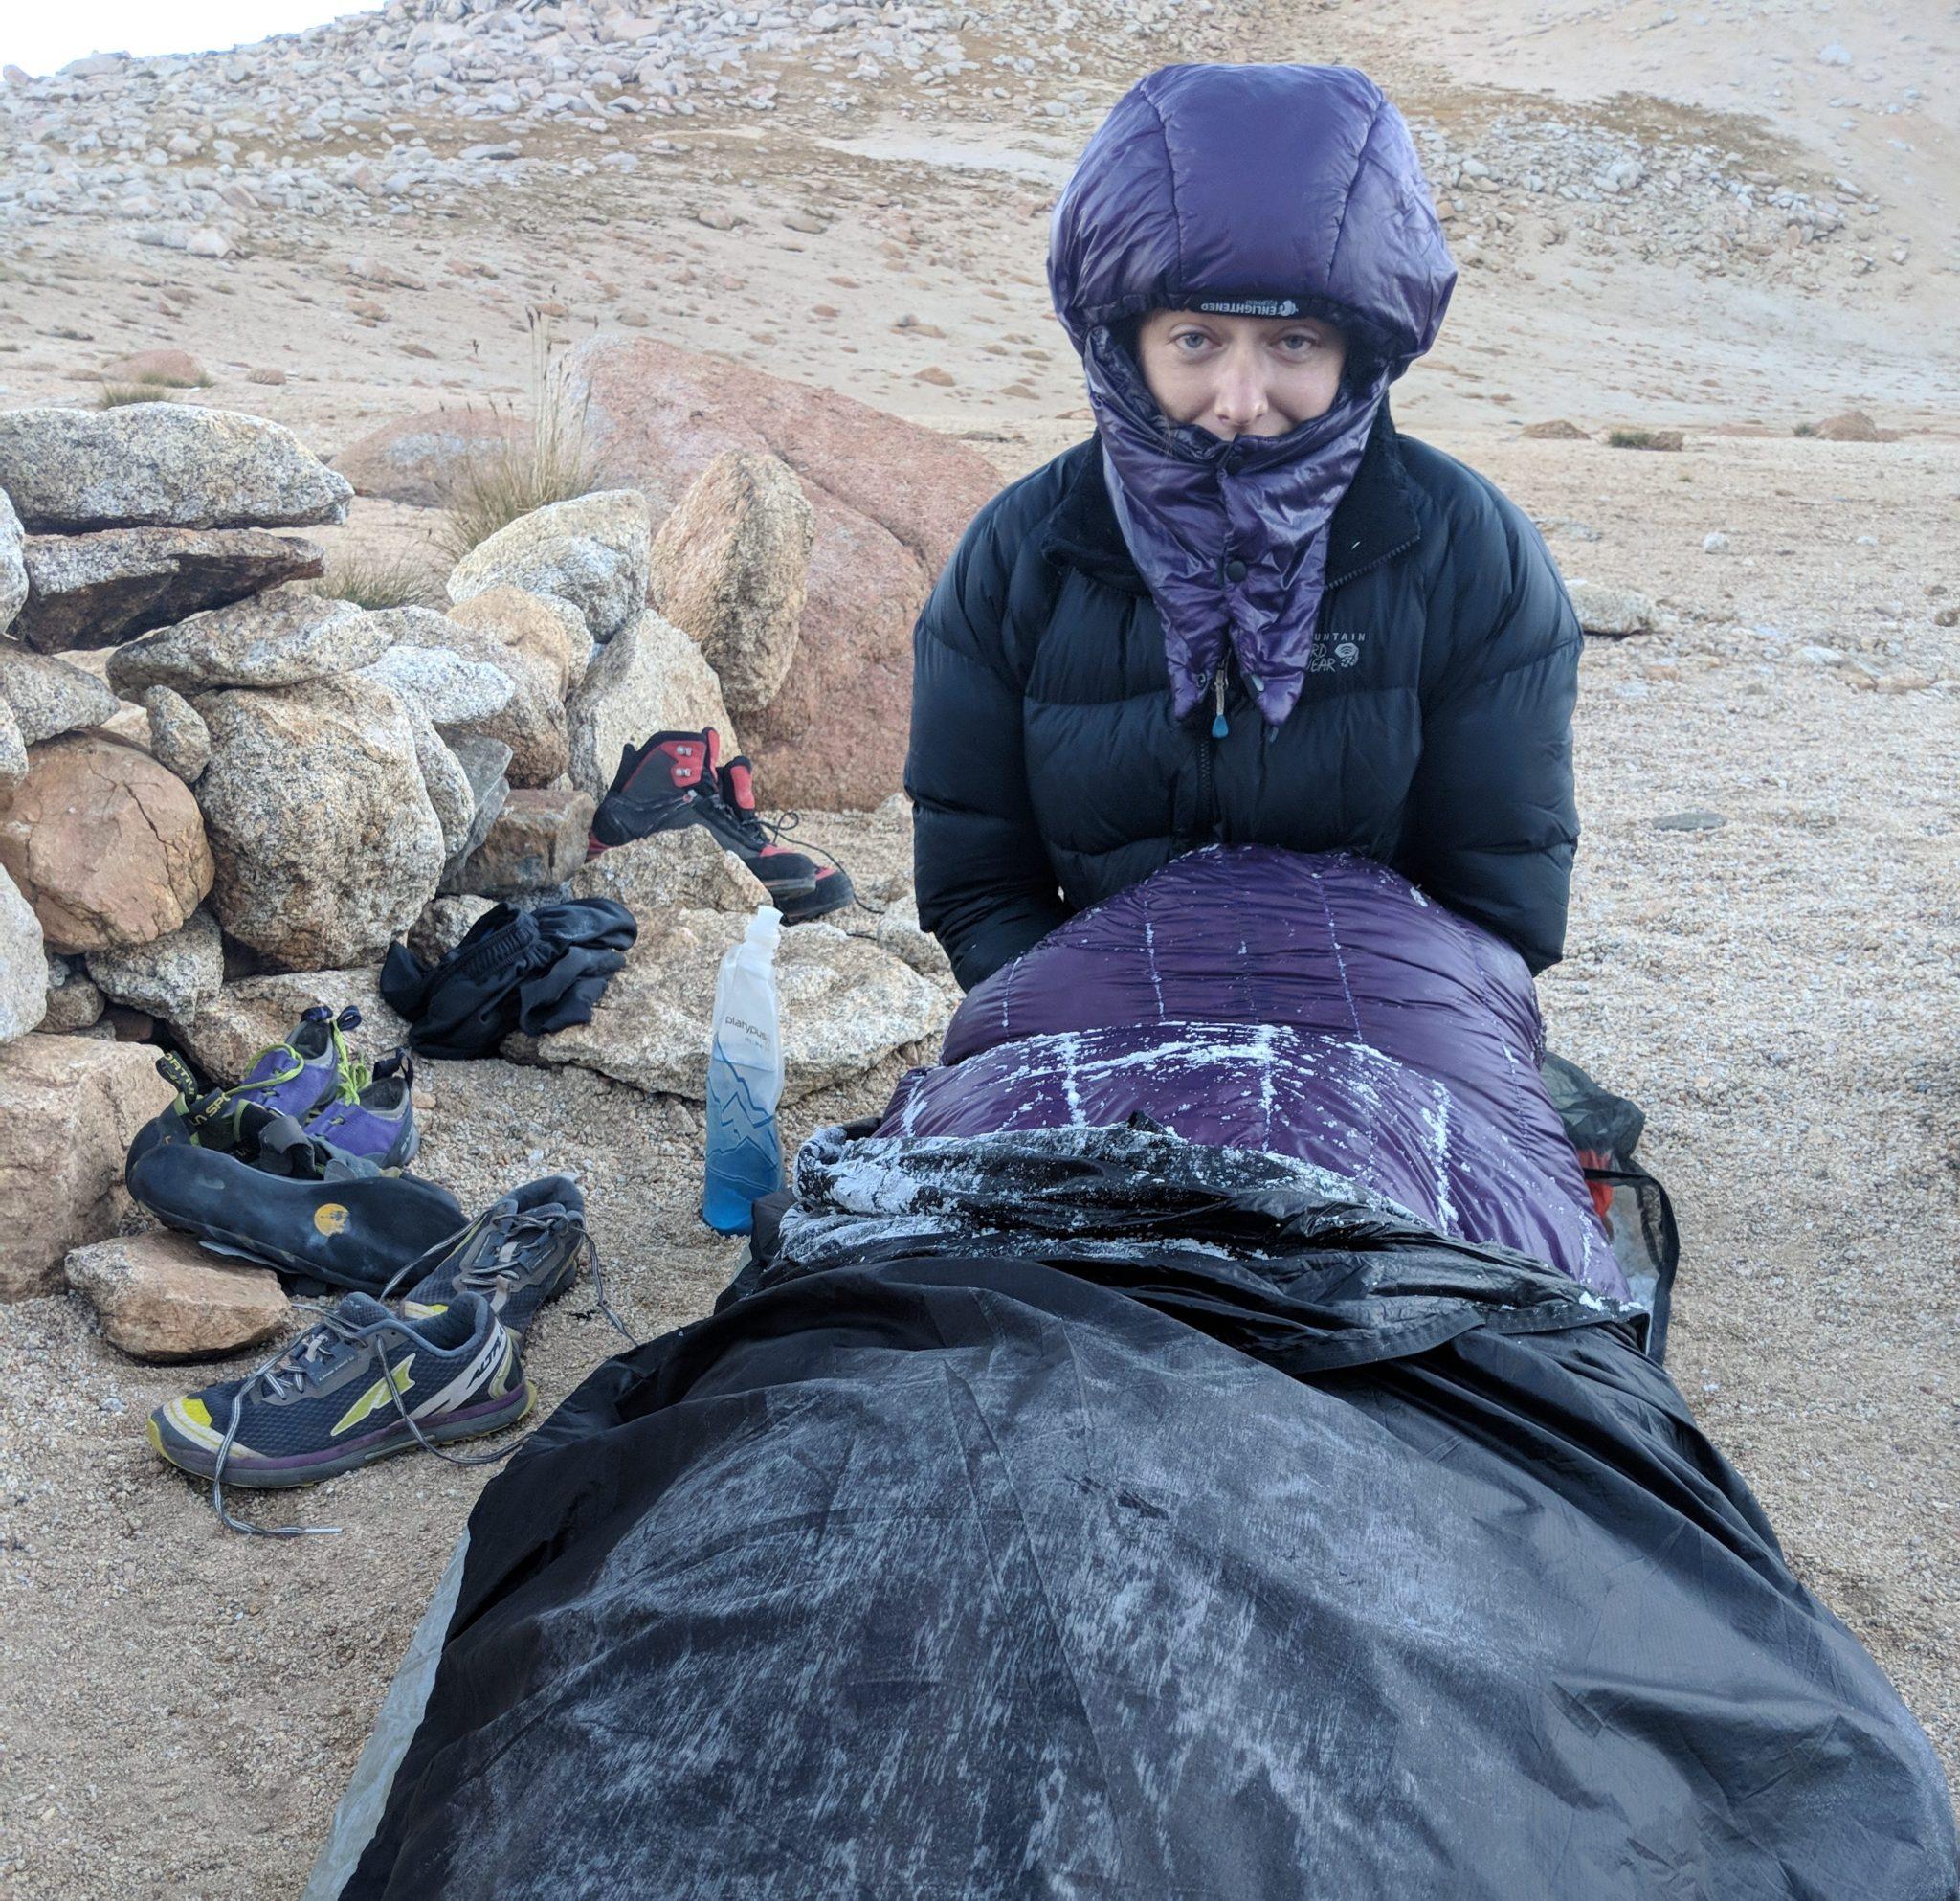 Frost on sleeping quilt near Williamson